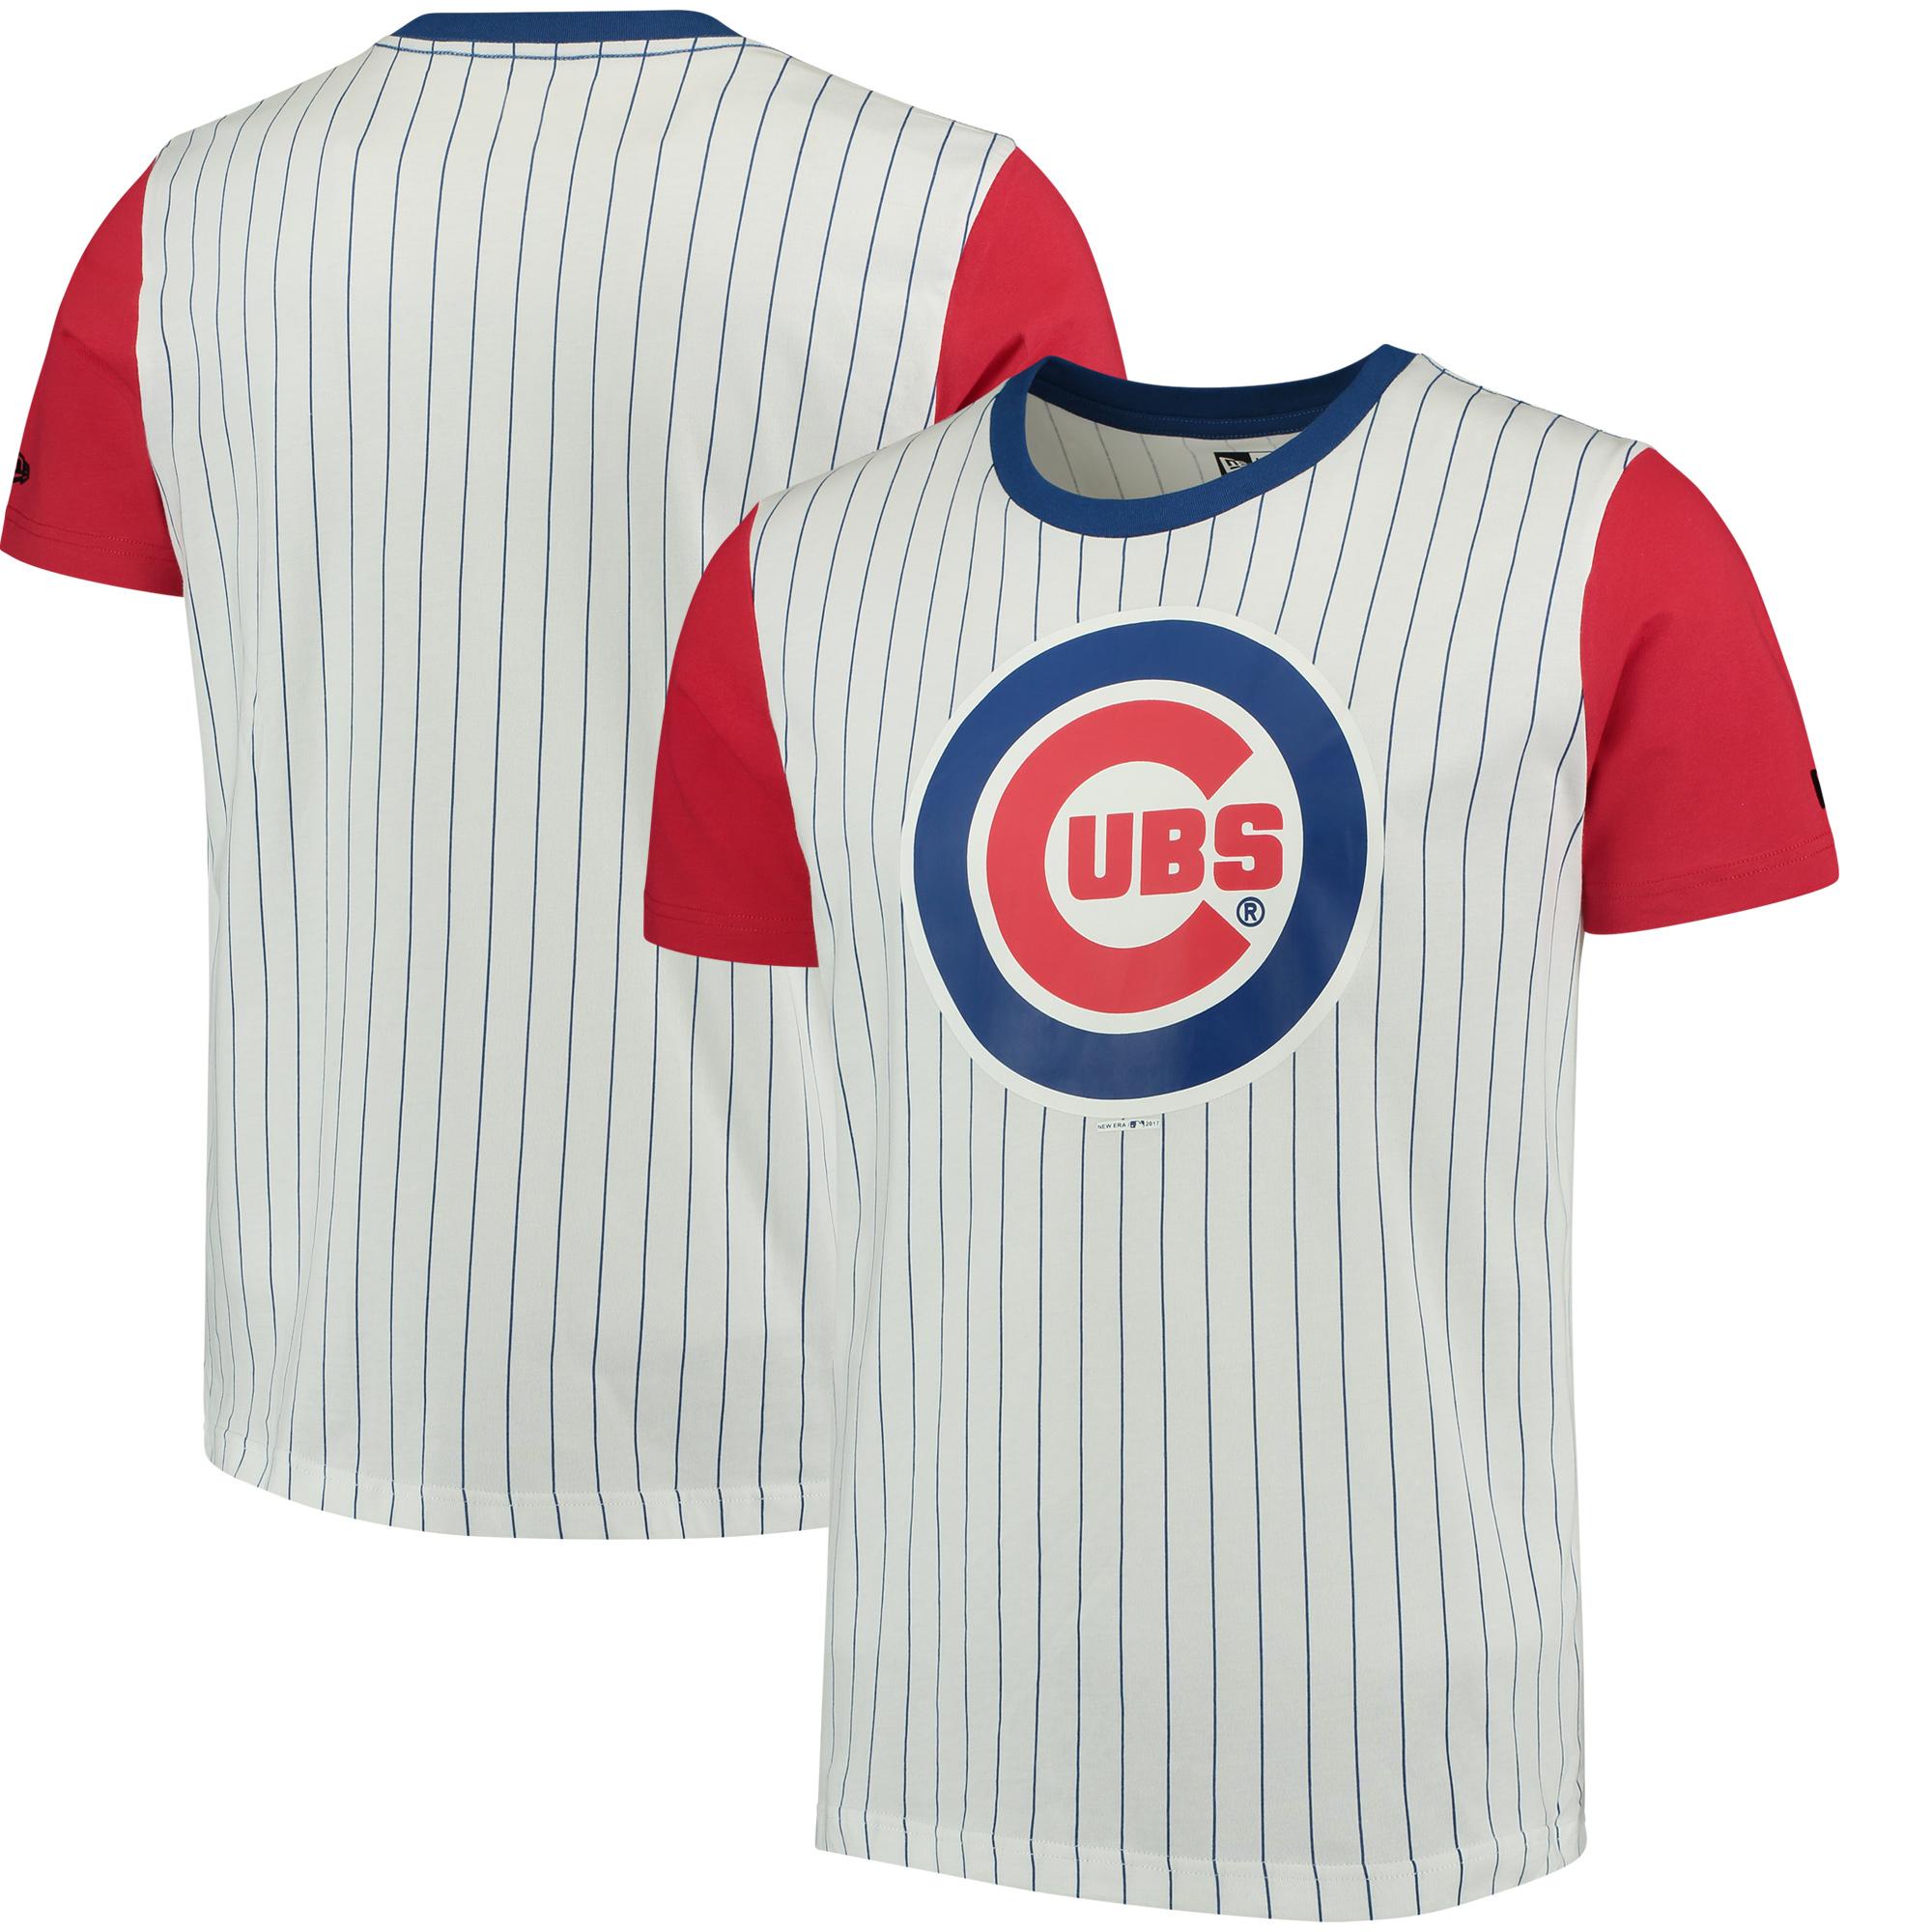 Chicago Cubs New Era Pinstripe Baseball T-Shirt - White/Red